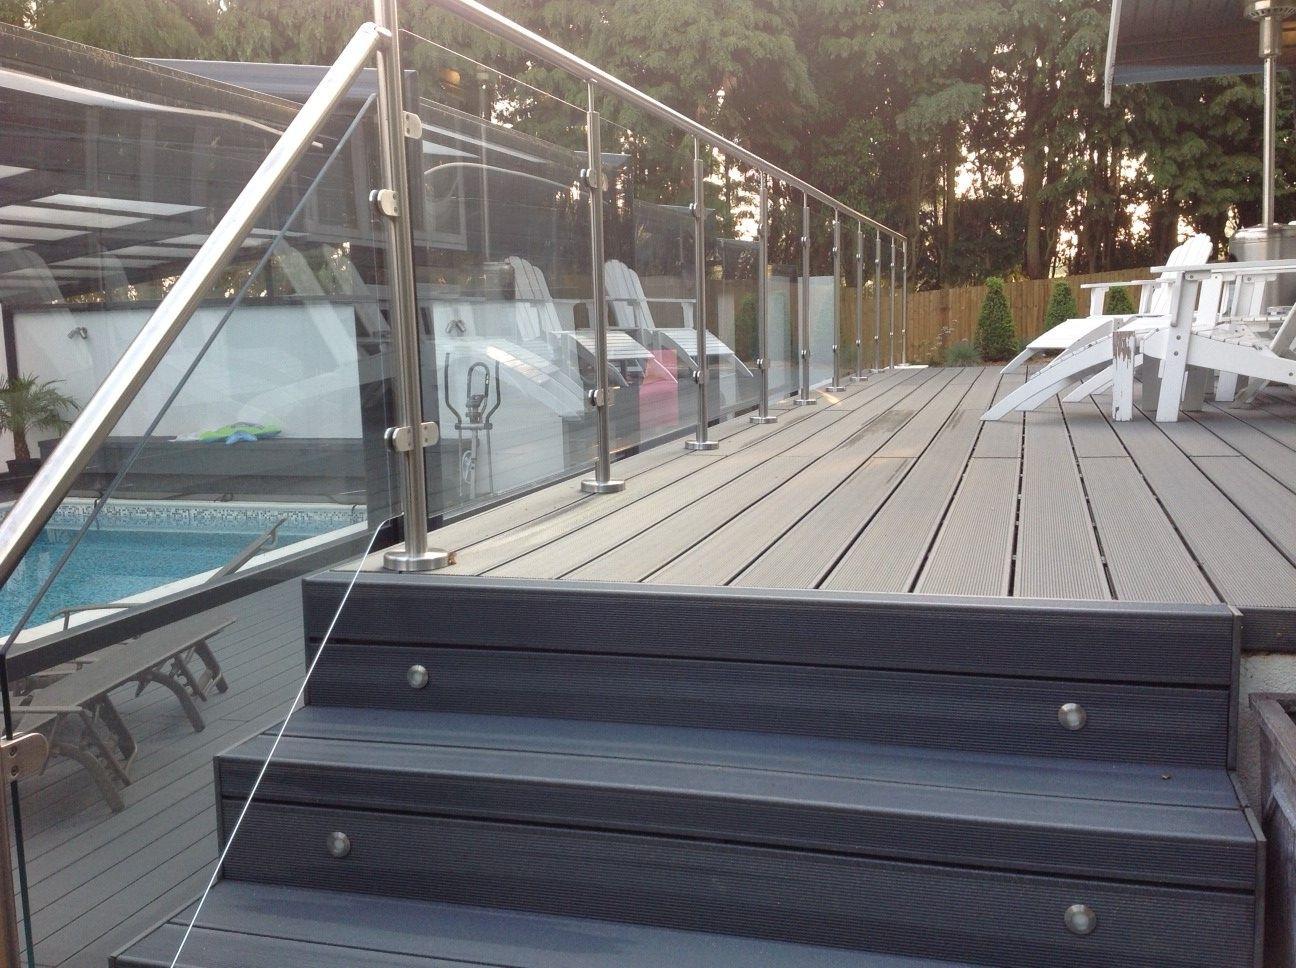 Swimming Pool Fencing Railings Balustrades Glass Stainless Steel Frameless Uk Trapleuningen Deurbeslag Hekwerk